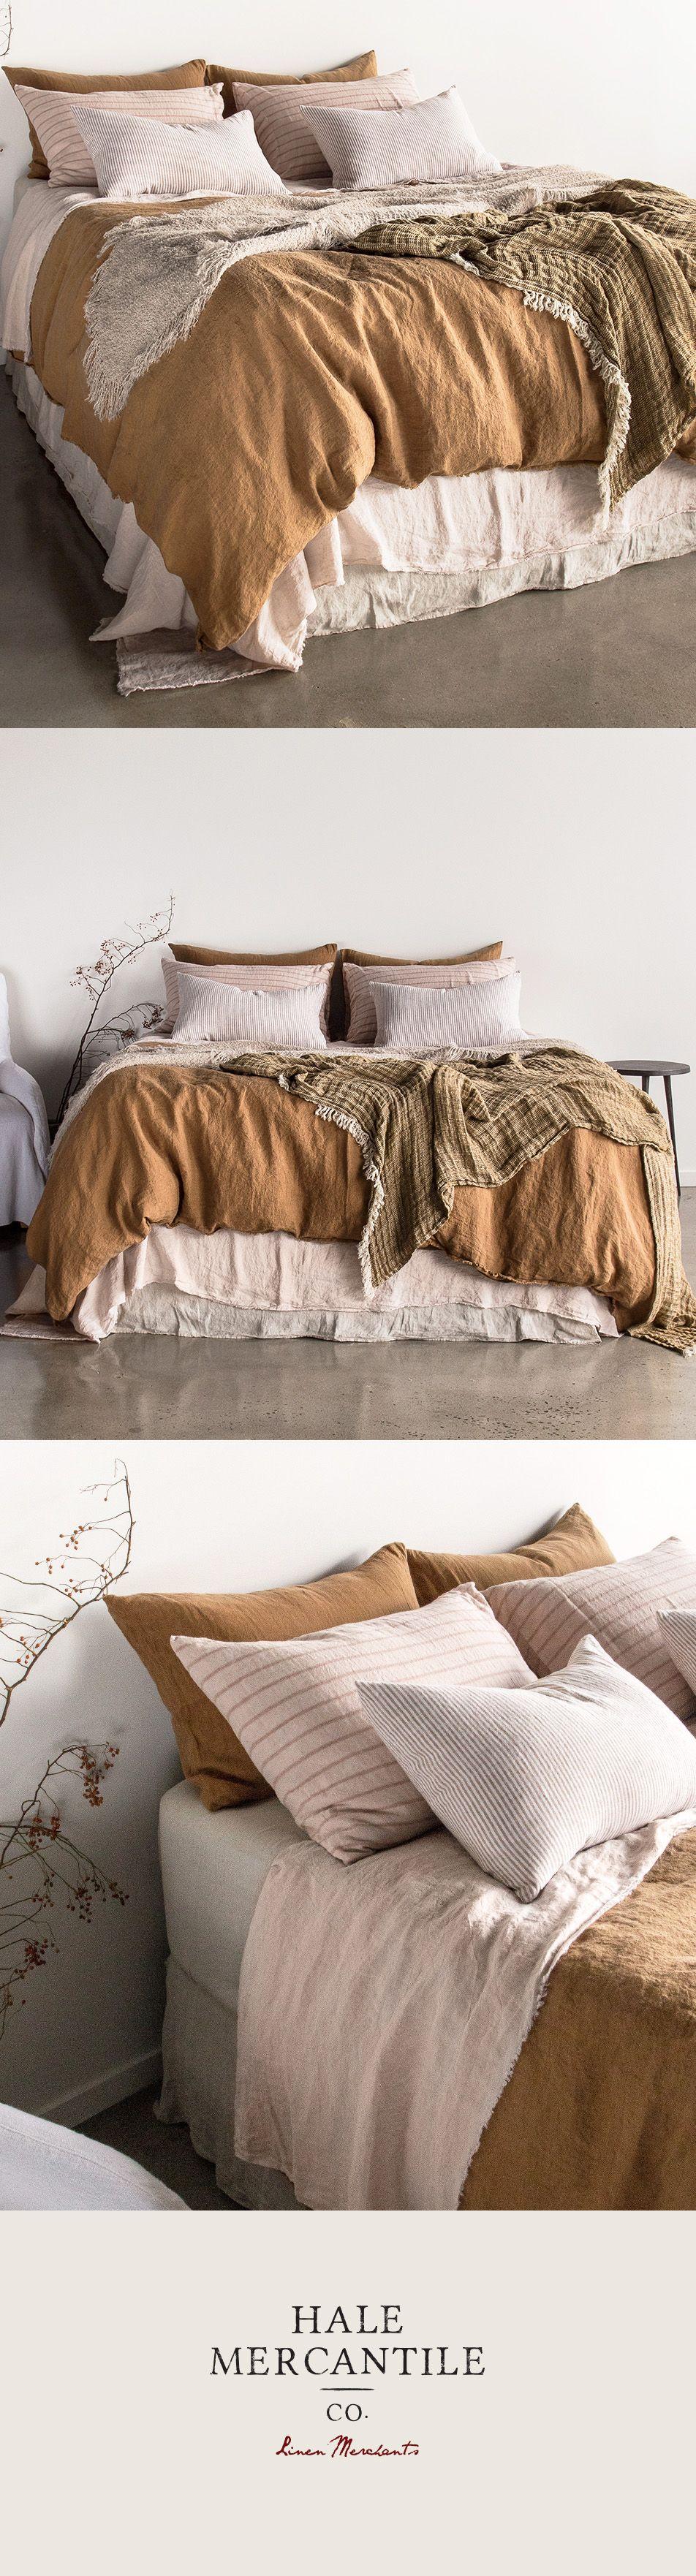 Linen sheets - Hale Mercantile Co.